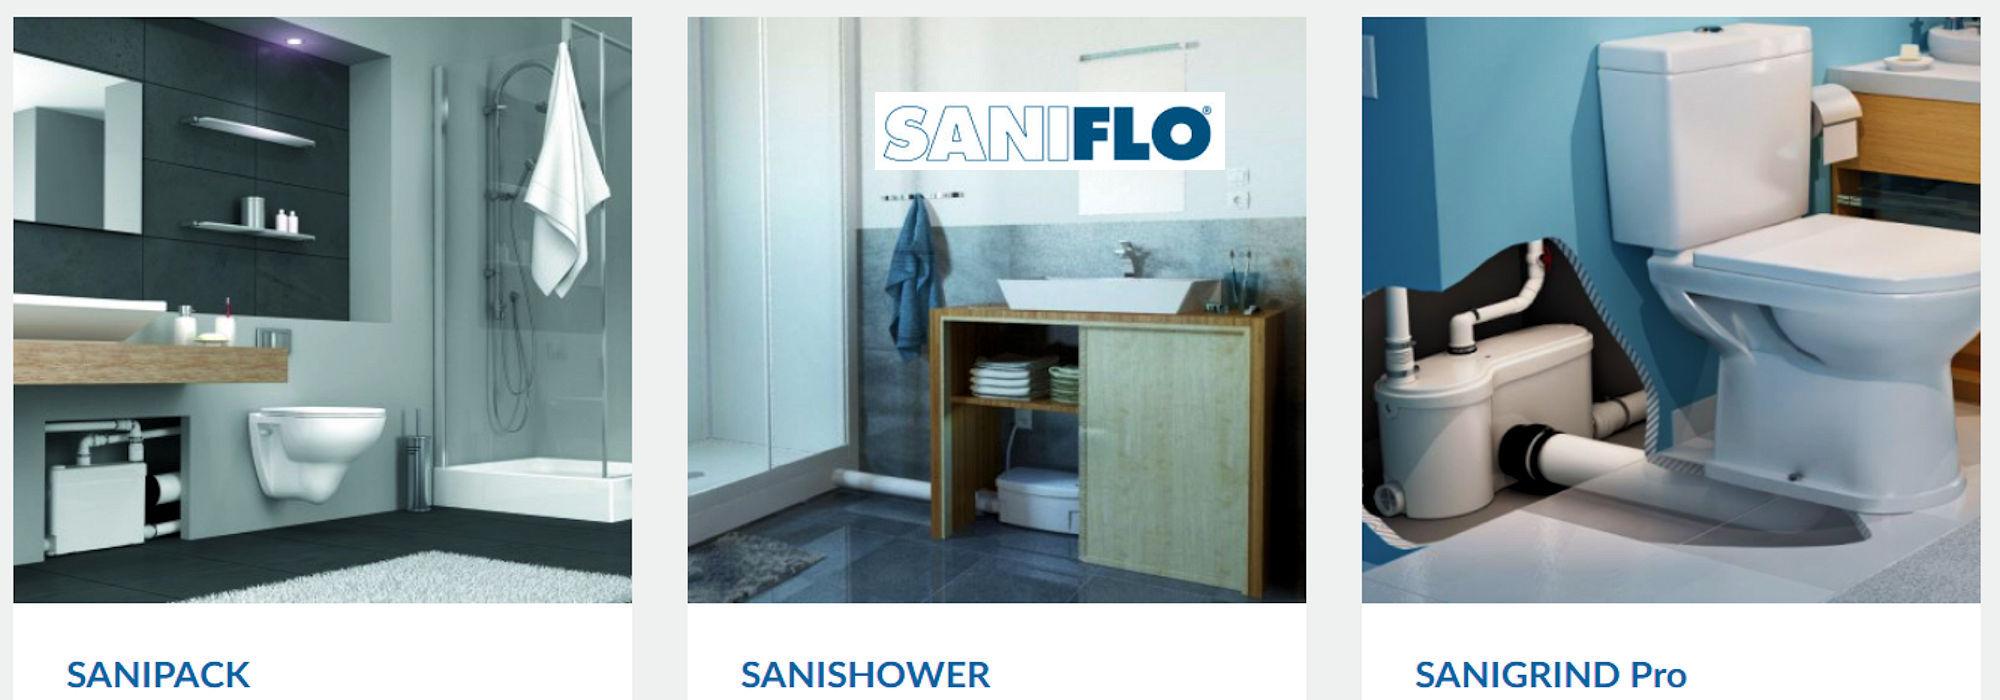 Saniflo_Sanipack_Sanishower_Sanigrind_Pro_w_logo_